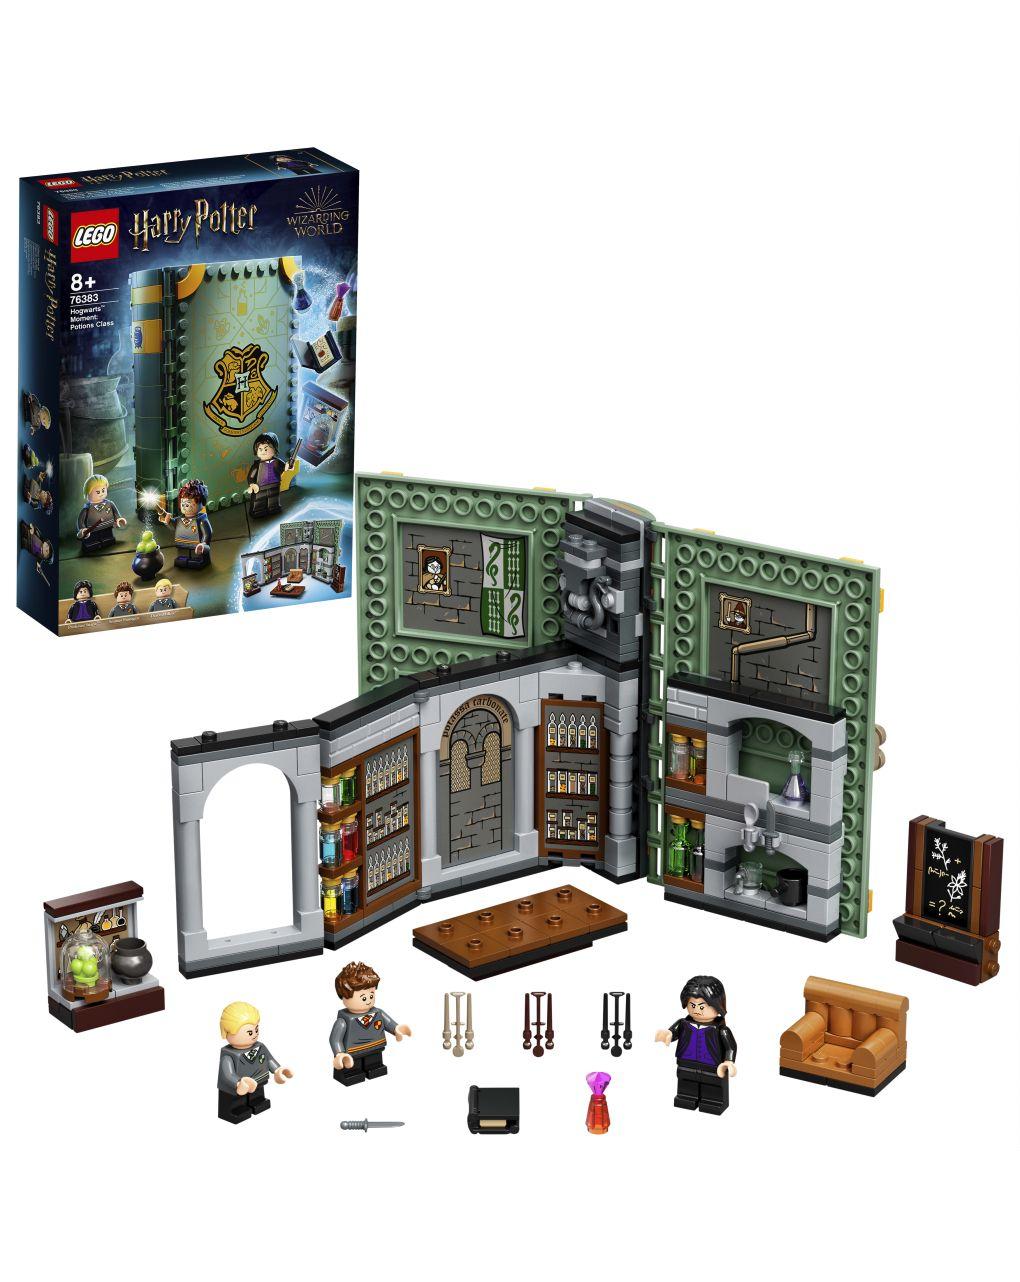 Lego harry potter tm - lezione di pozioni a hogwarts™ - 76383 - LEGO